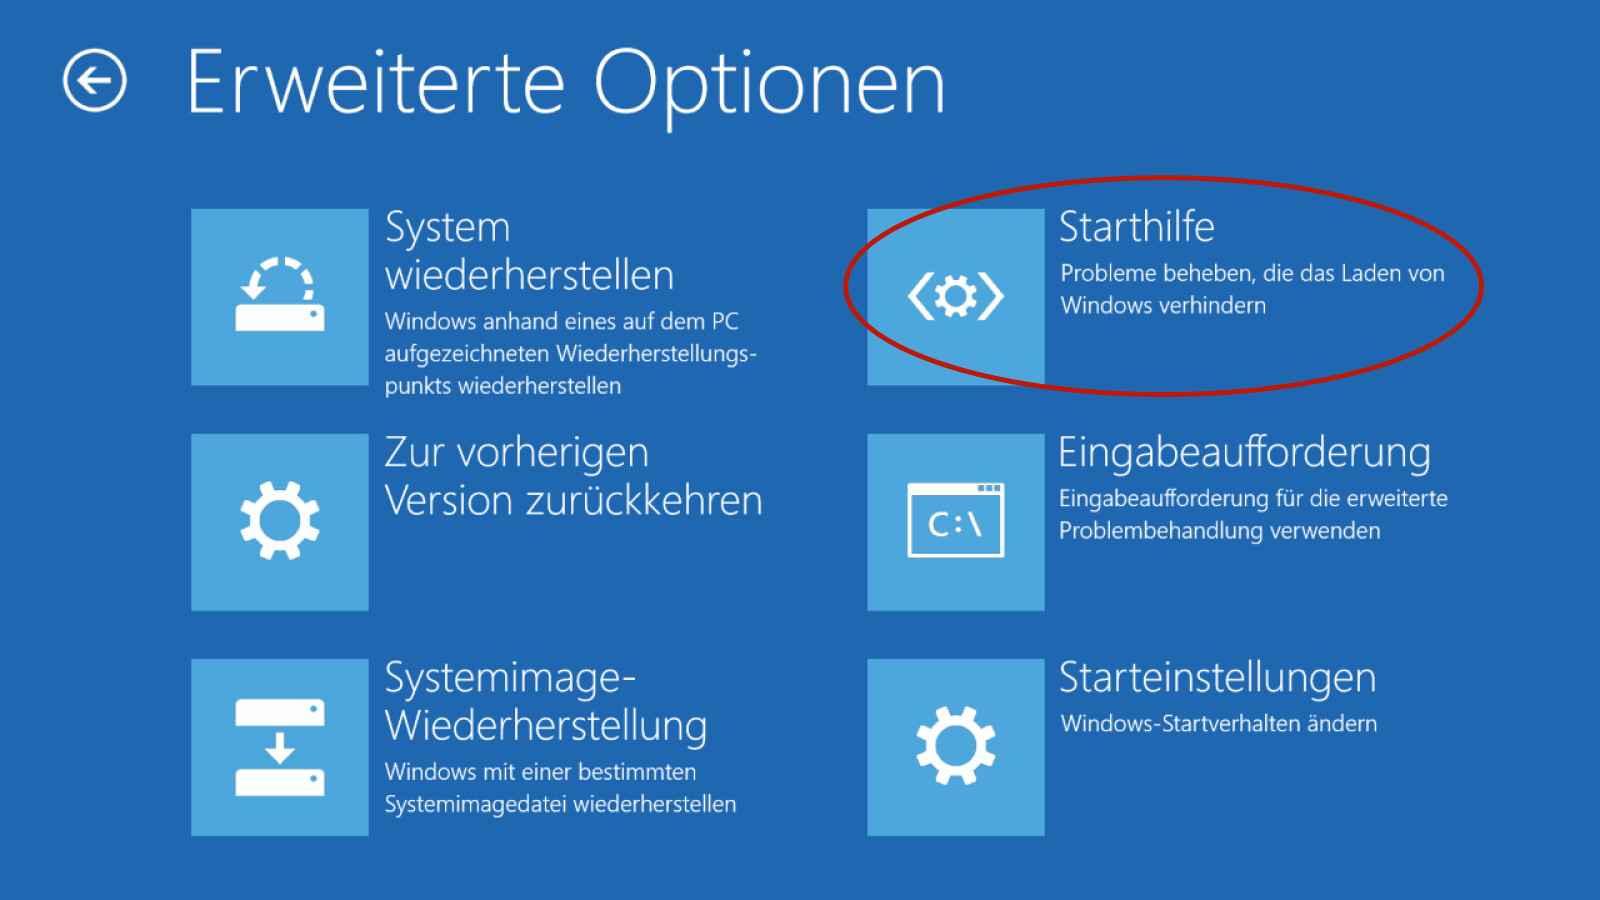 Windows Starthilfe